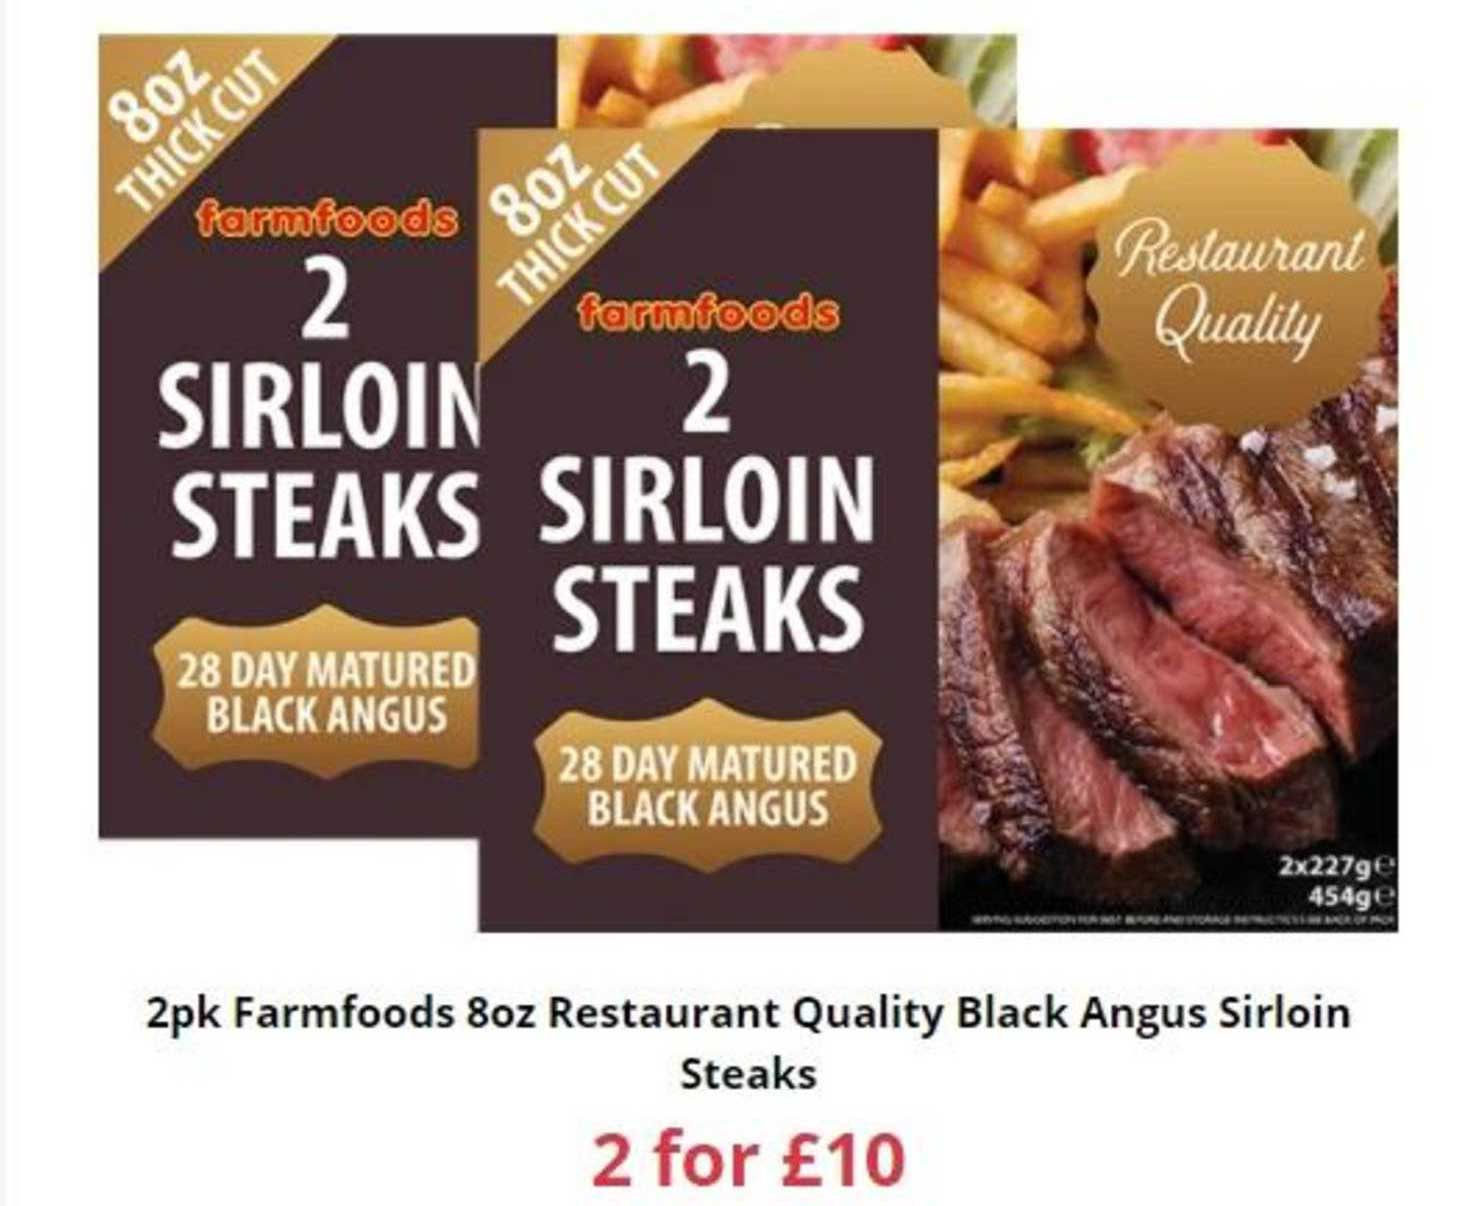 Farmfoods 2pk Farmfoods 8oz Quality Black Angus Sirloin Steaks